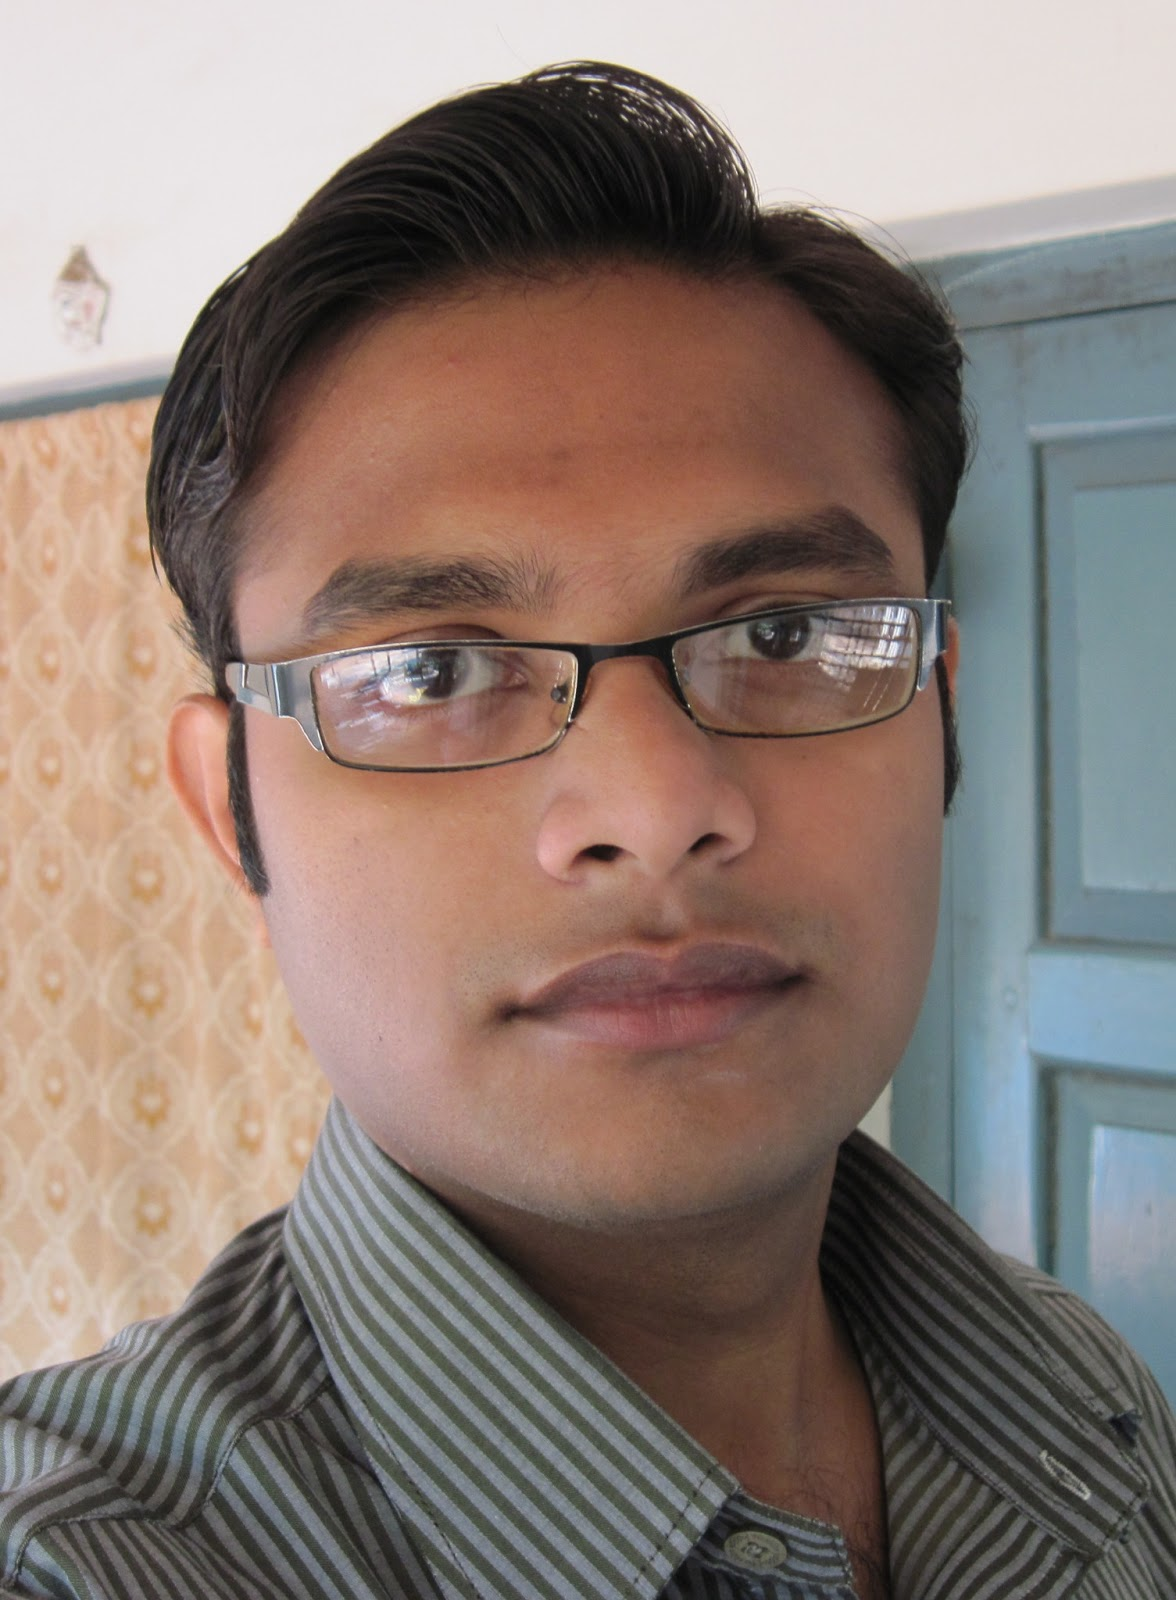 arpita mitra barui Dr debdas rakshit & dr susanta mitra mahesh kumar kurmi part  23  arts english and prof arpita chattaraj shamima sultana part- time  barui (ba sak) part- time r- phd/ regn/ pol sc/a/ 538/1 (4) 151.